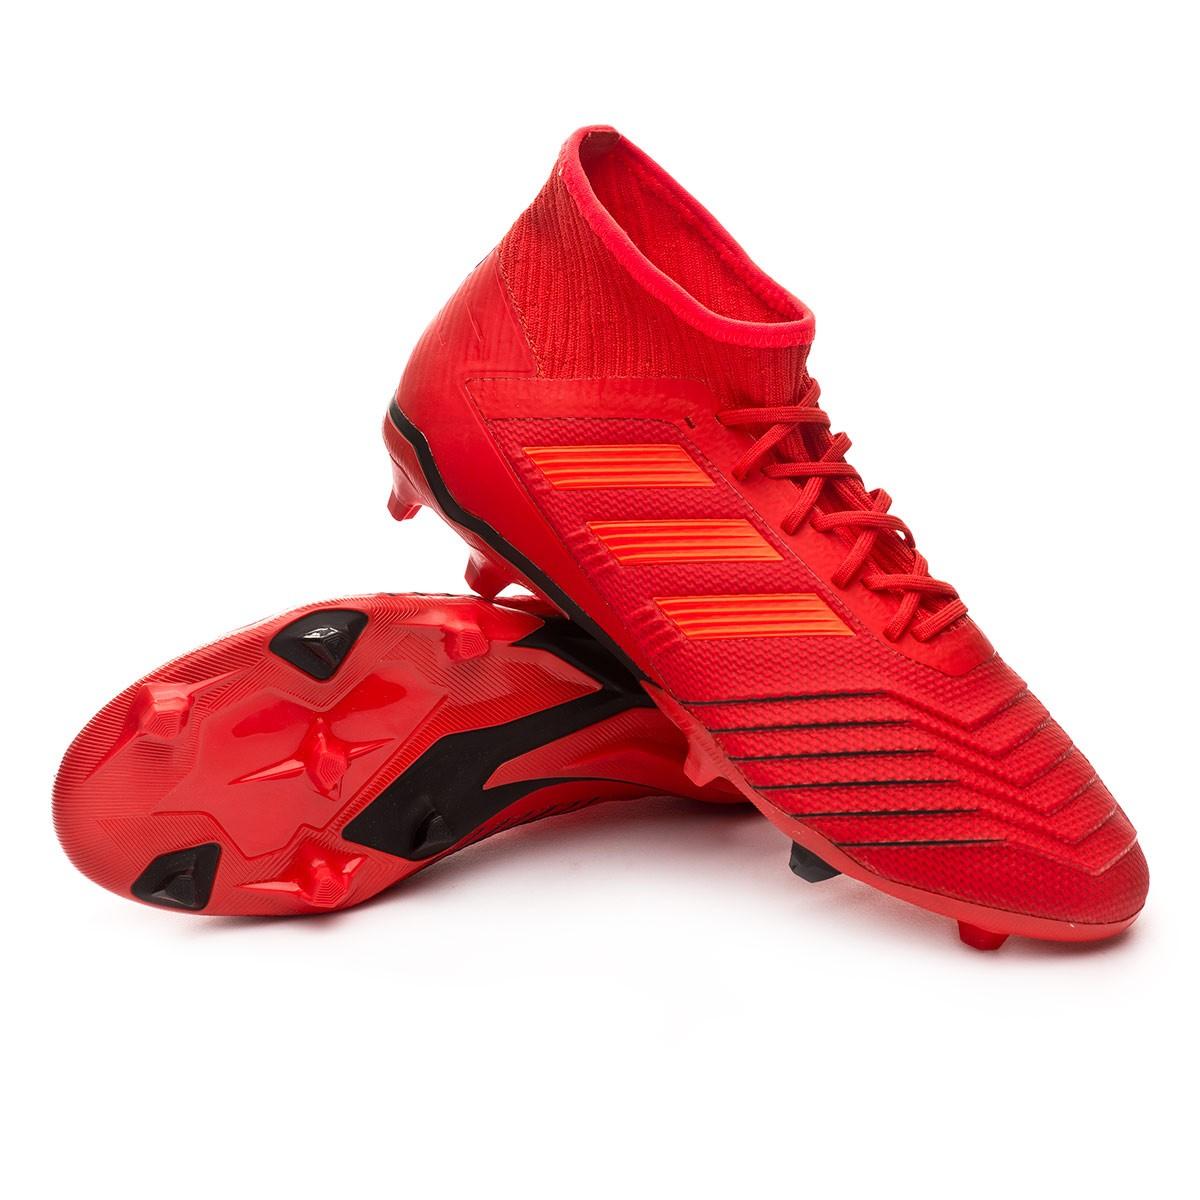 Adidas Predator 19.2 Firm Ground